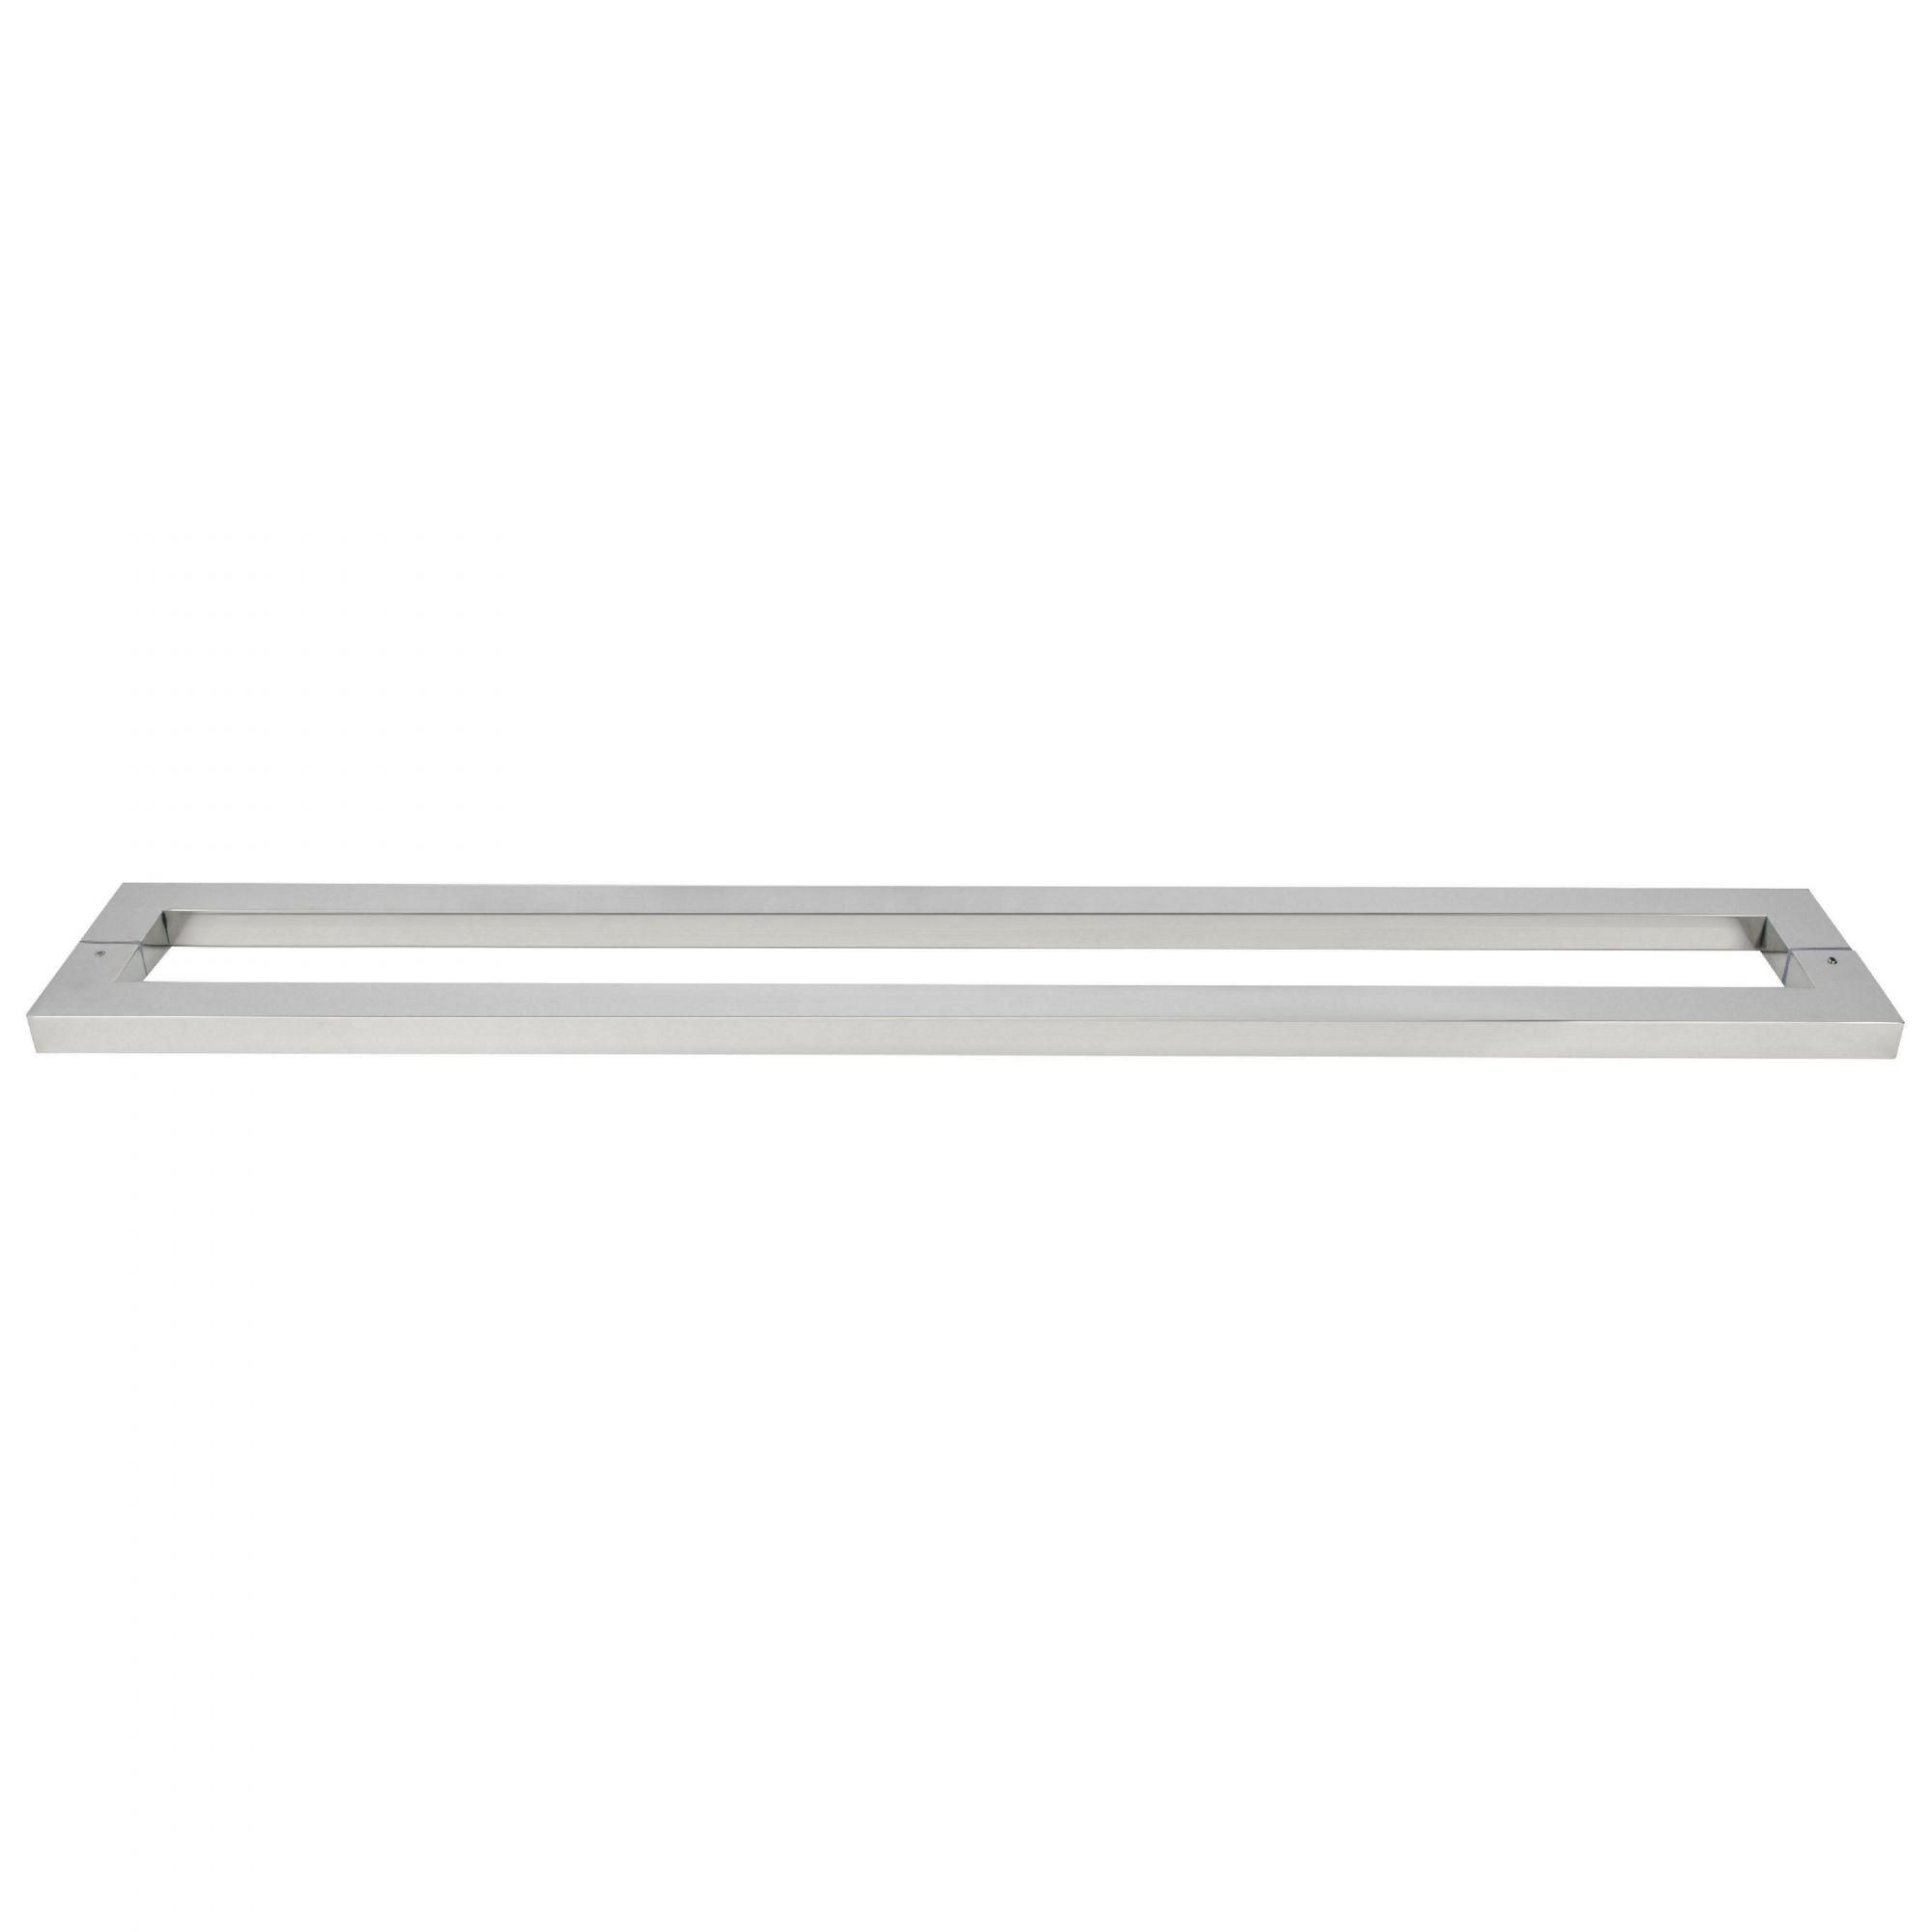 Puxador inox para porta madeira e vidro retangular barra chata 1m H12